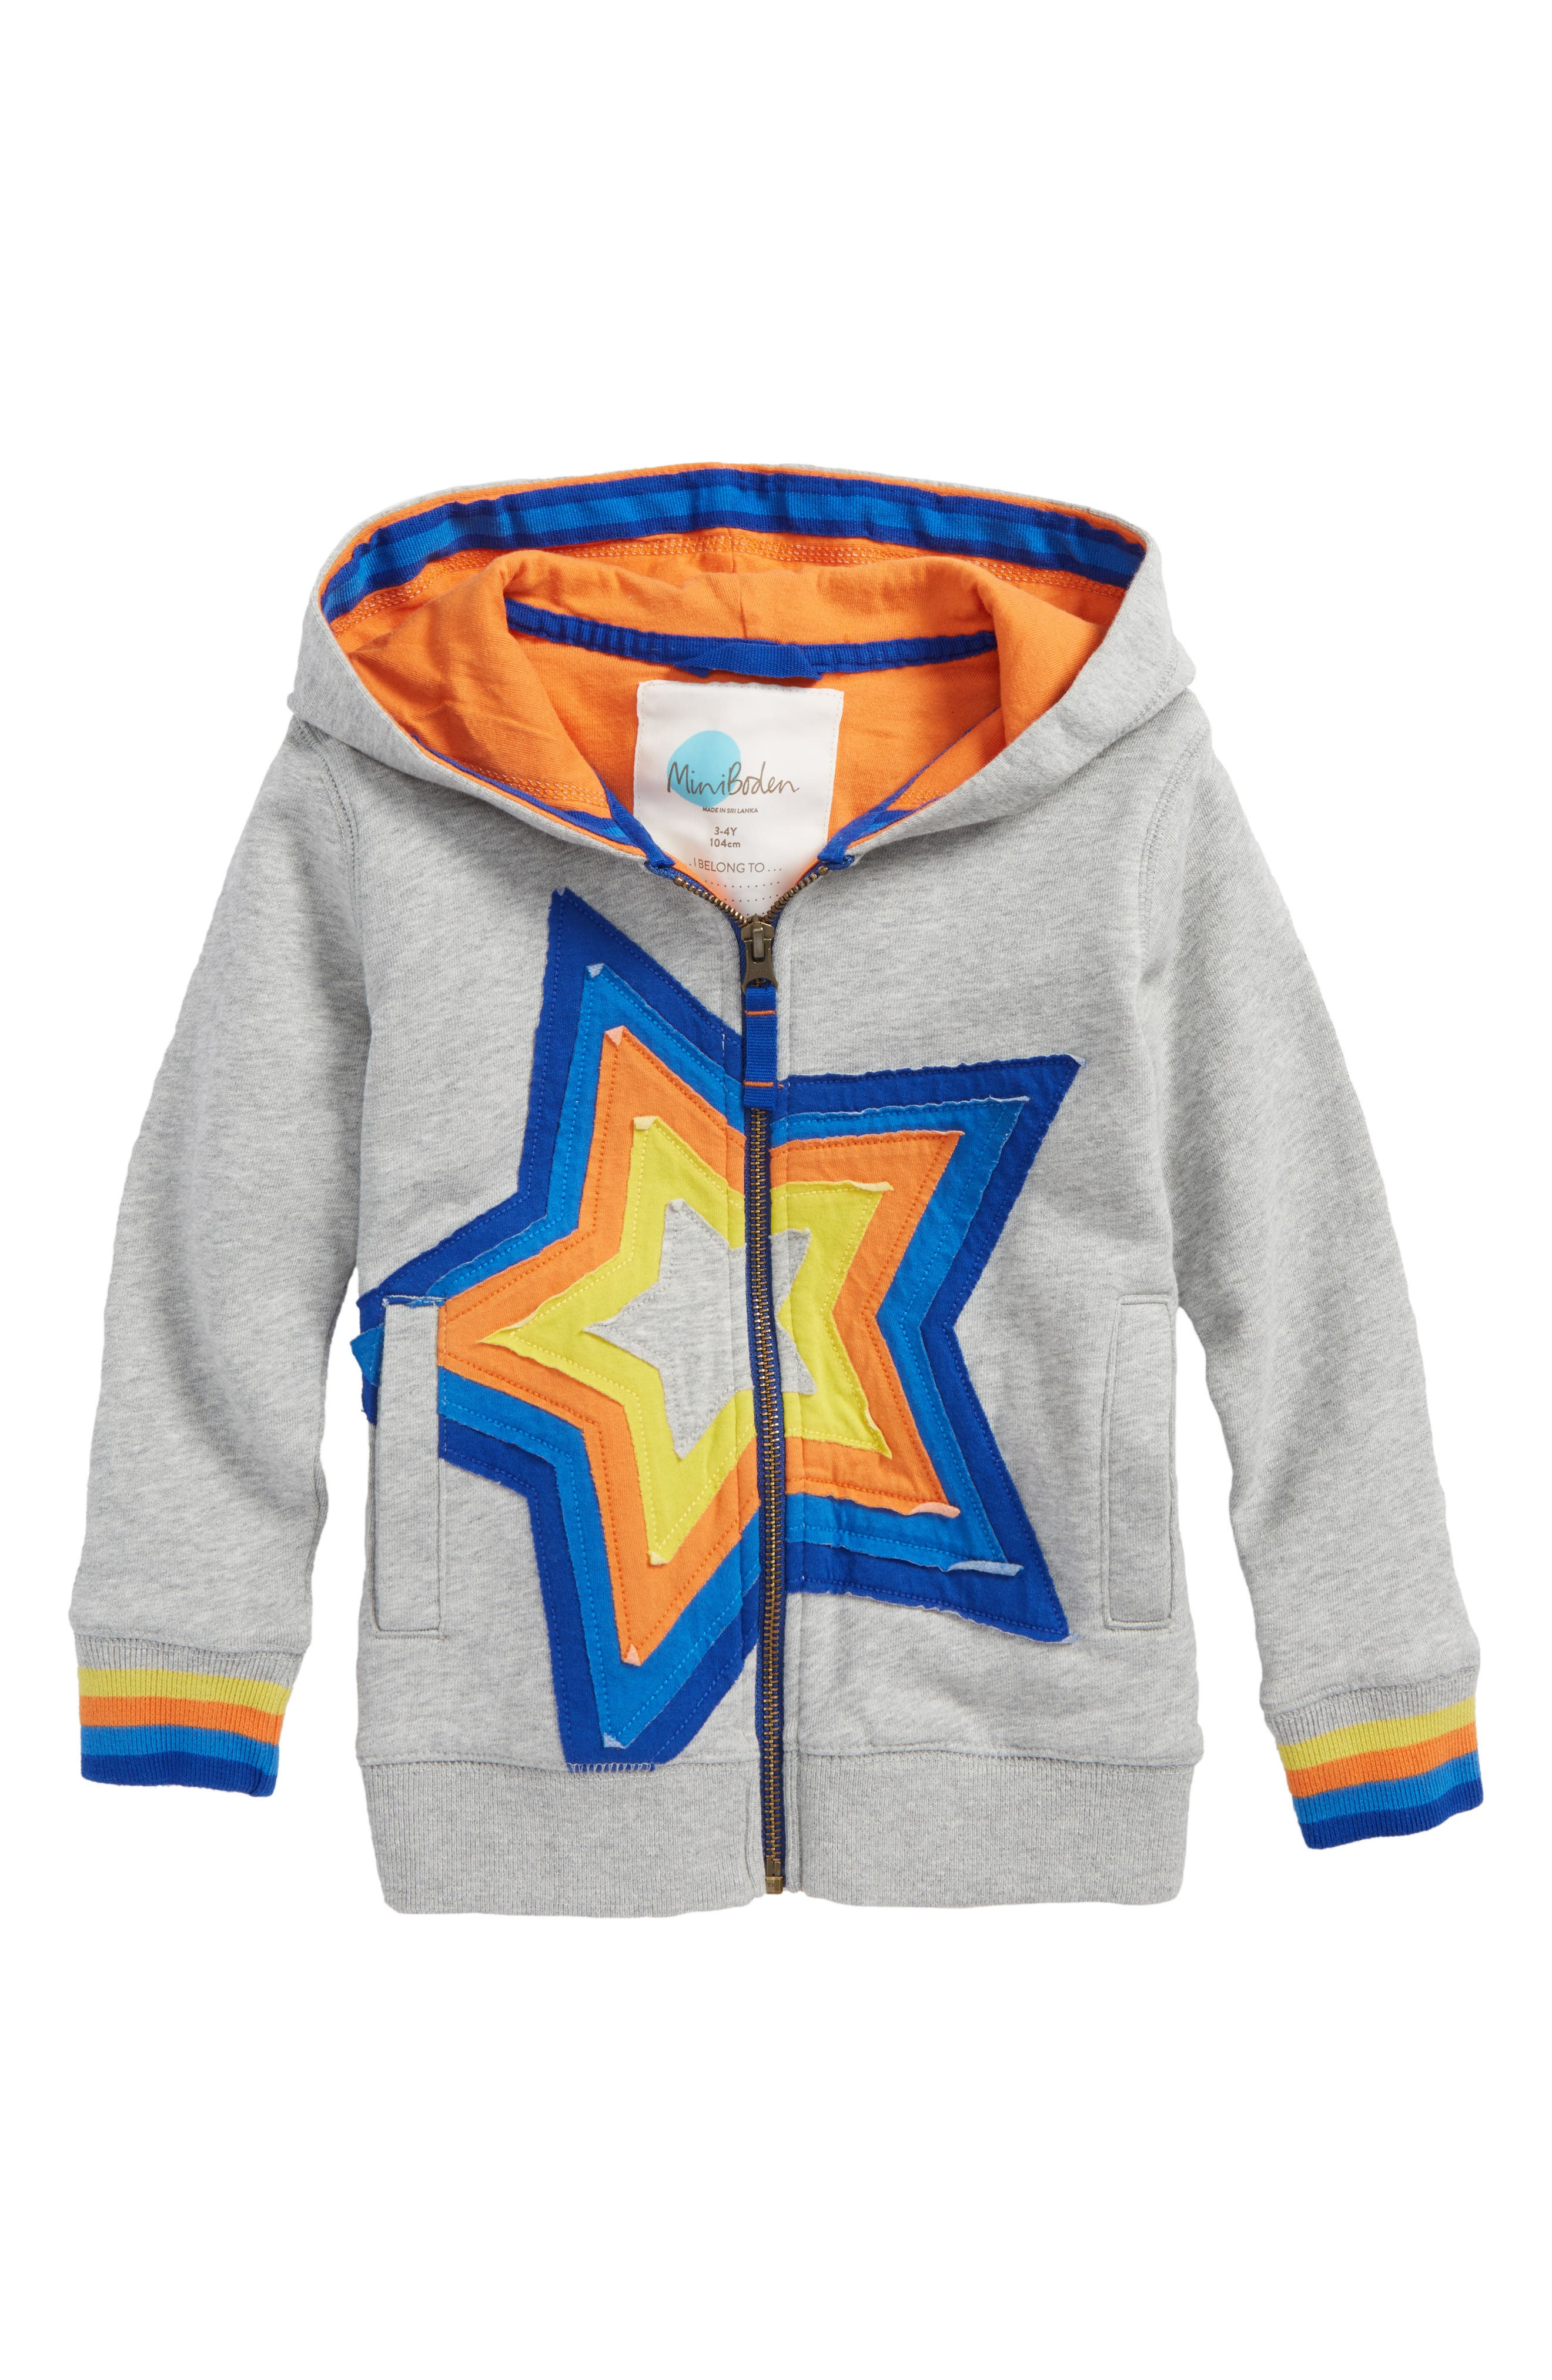 Starry Zip Hoodie,                             Main thumbnail 1, color,                             Grey Marl